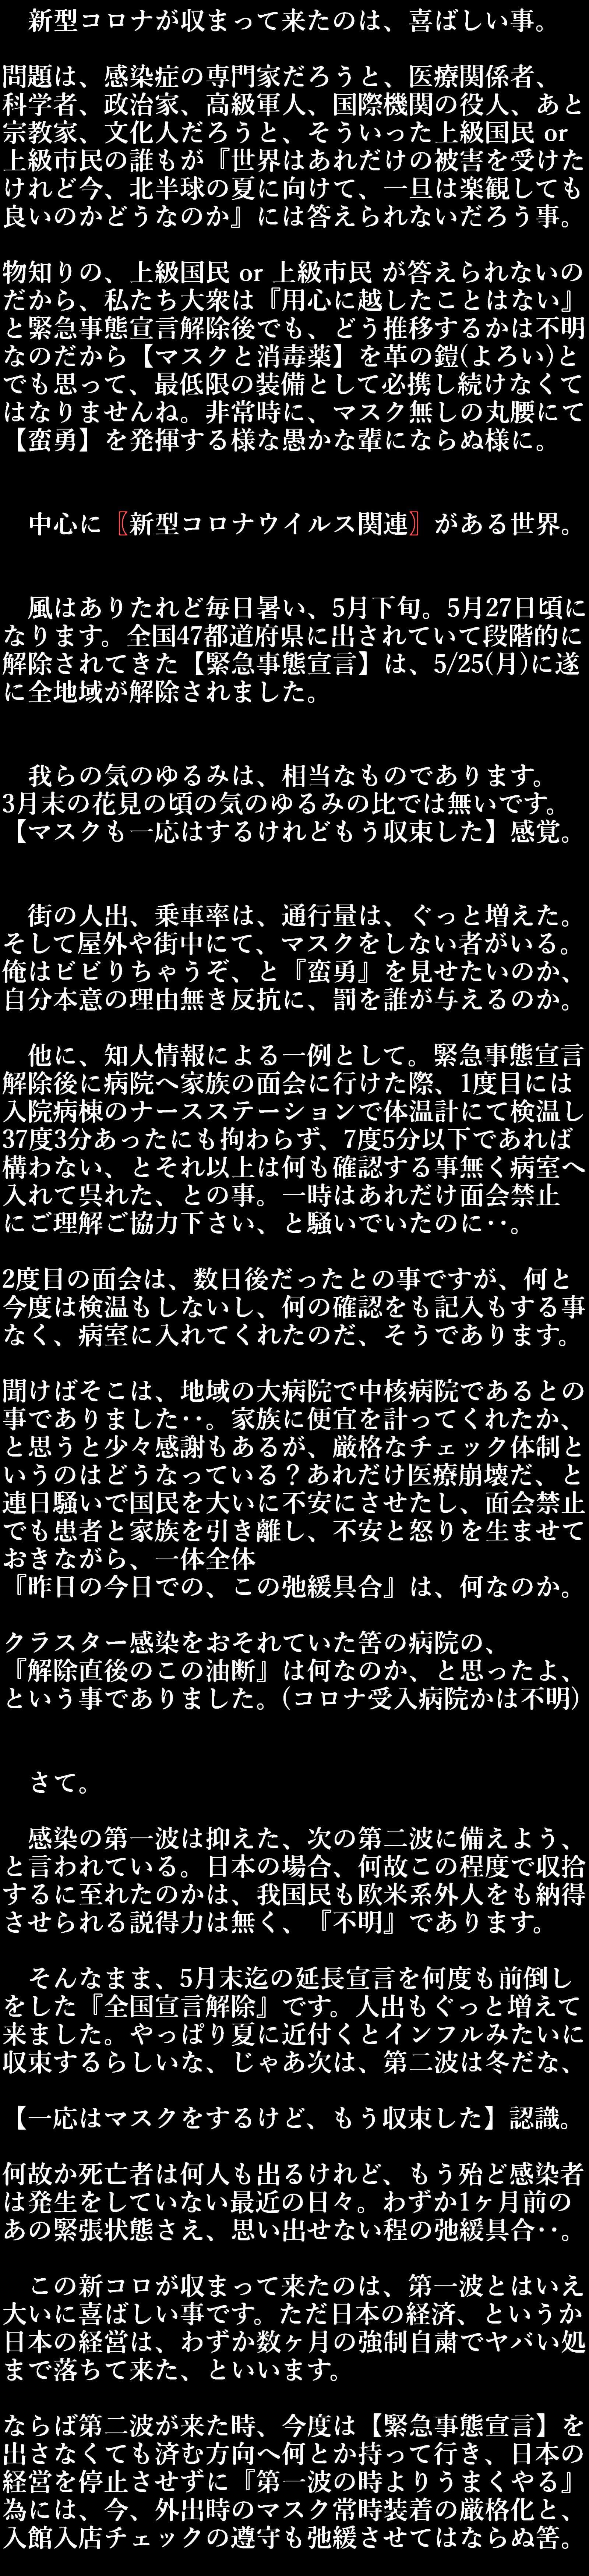 f:id:oomoroitakugoro:20200527154413bb3j:plain